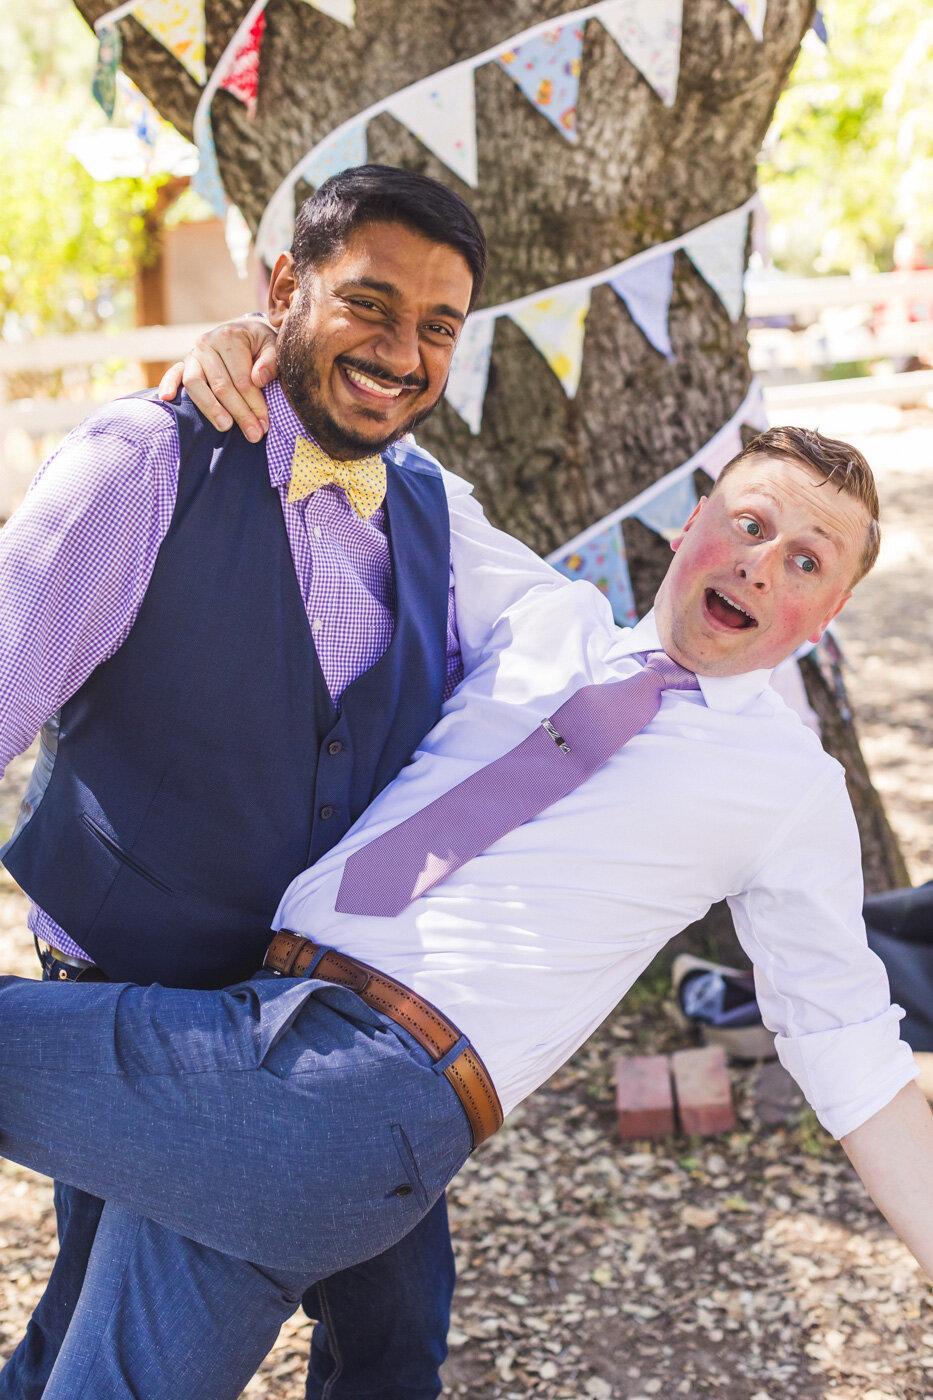 fun-wedding-guest-and-groom